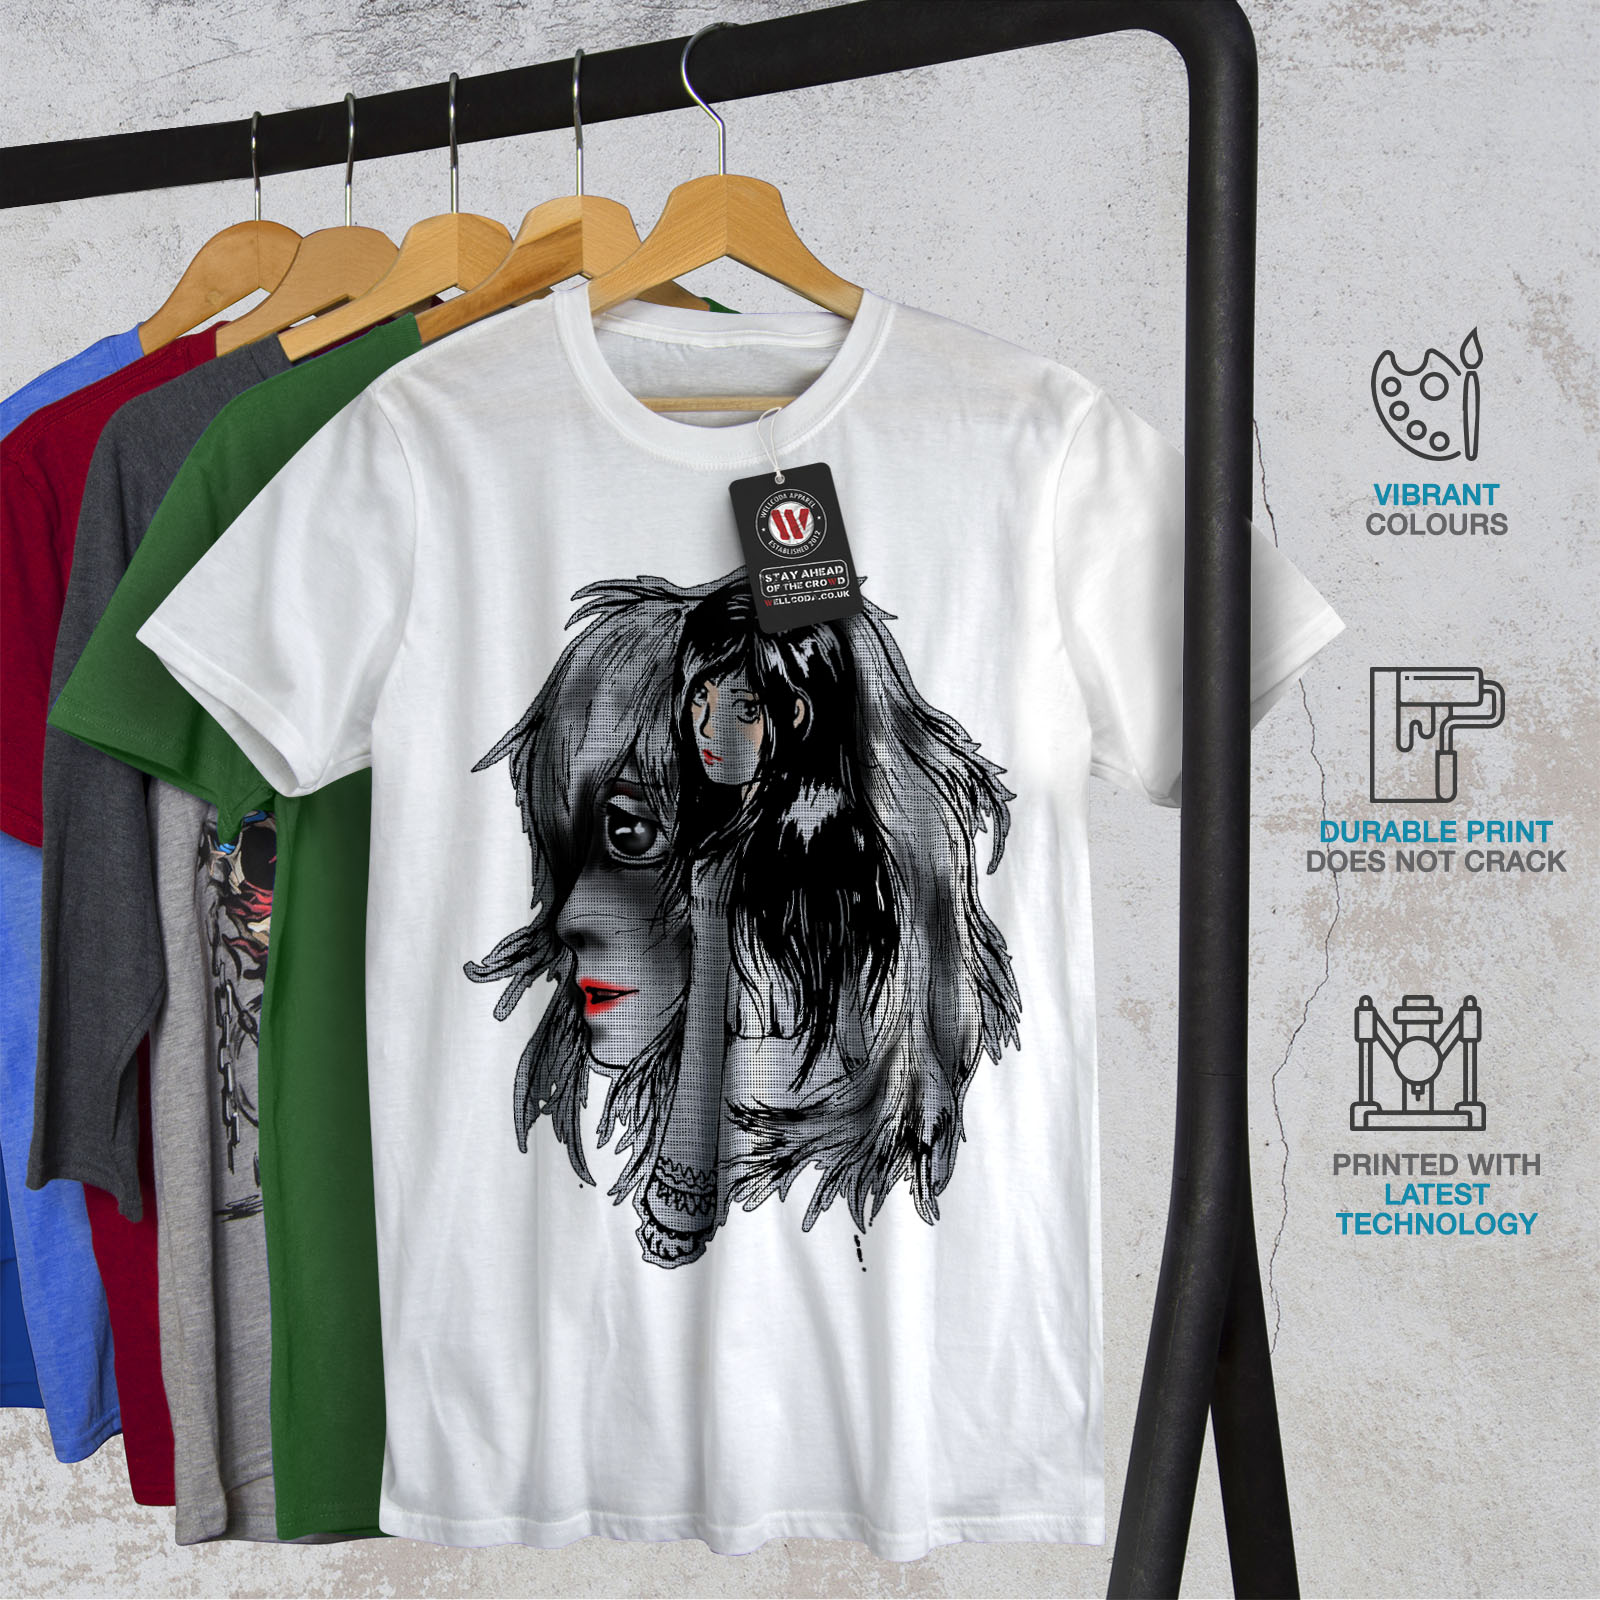 Wellcoda-bellissime-ANIME-Da-Uomo-T-shirt-misterioso-design-grafico-stampato-T-shirt miniatura 12